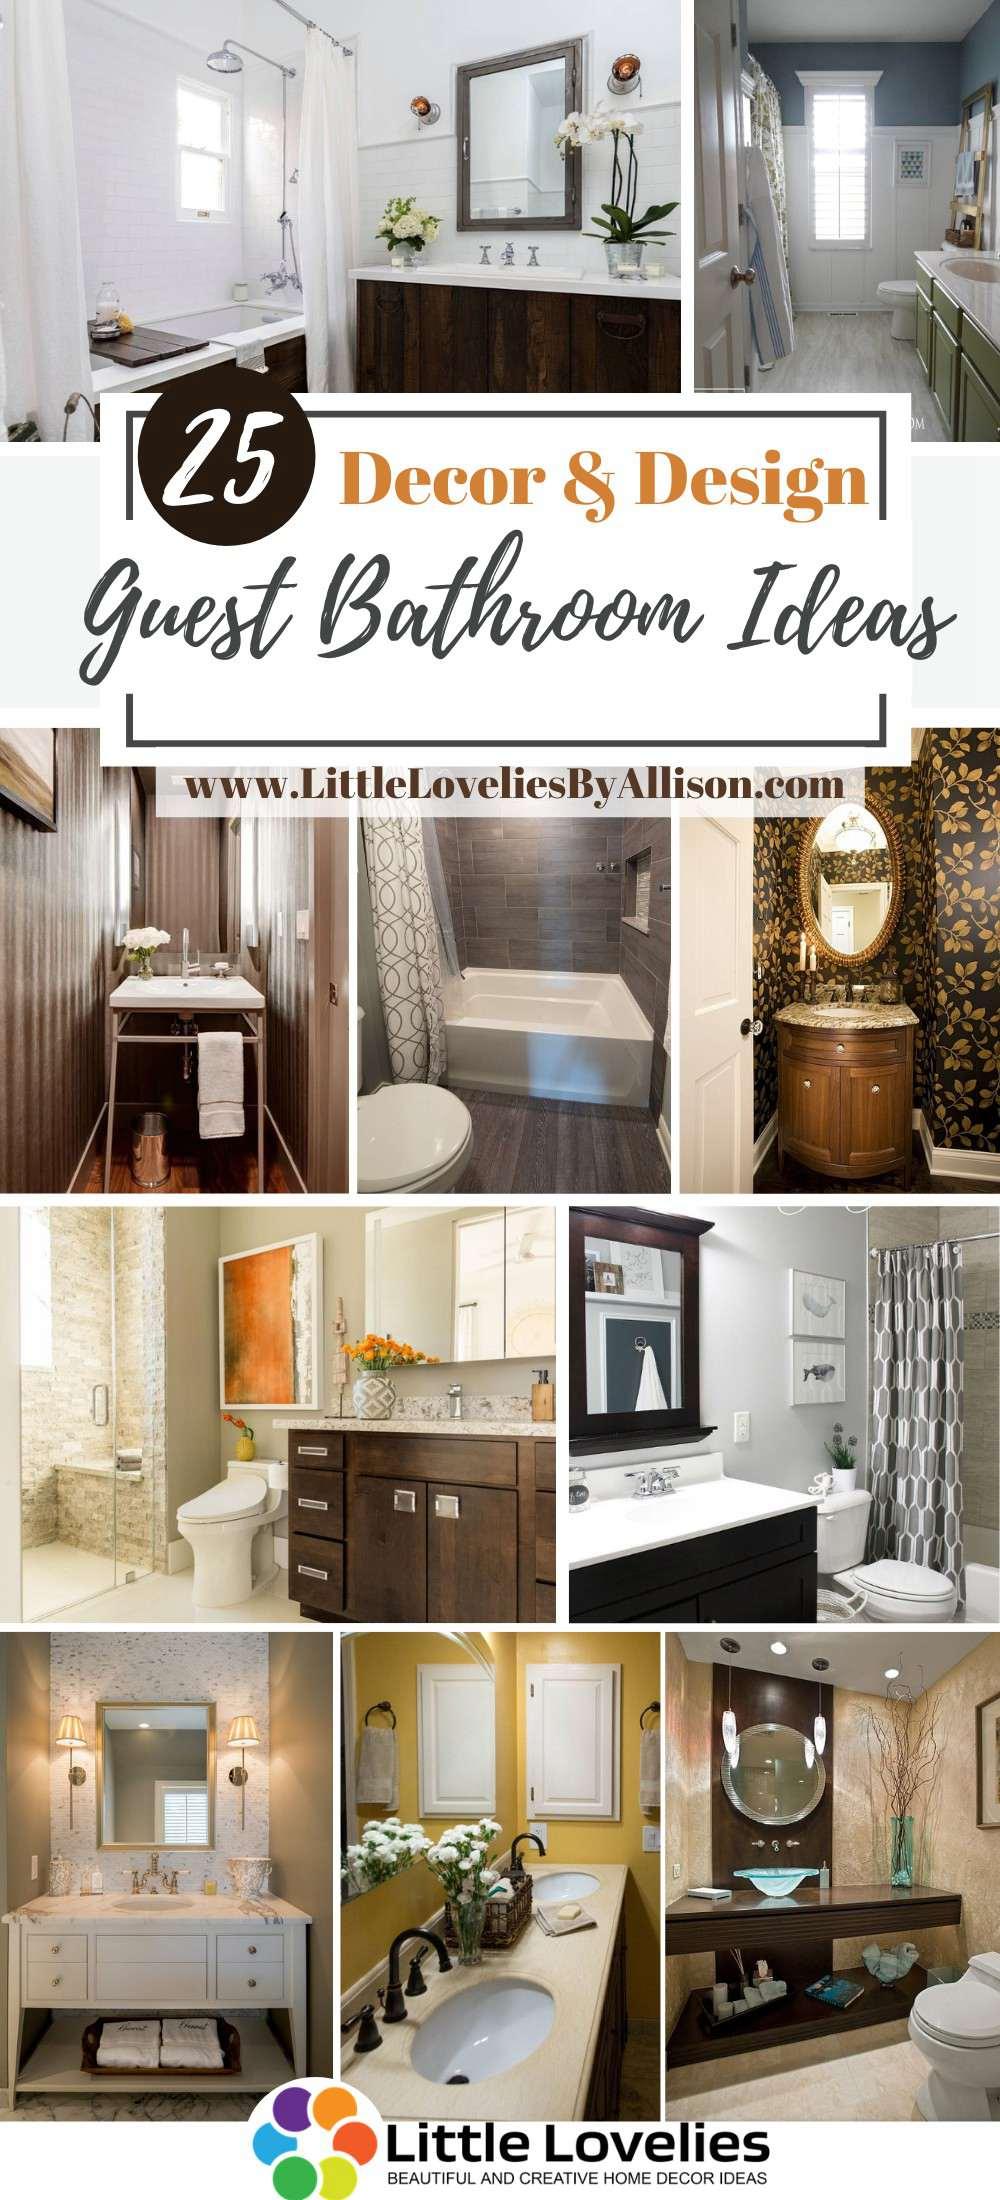 Guest-Bathroom-Ideas